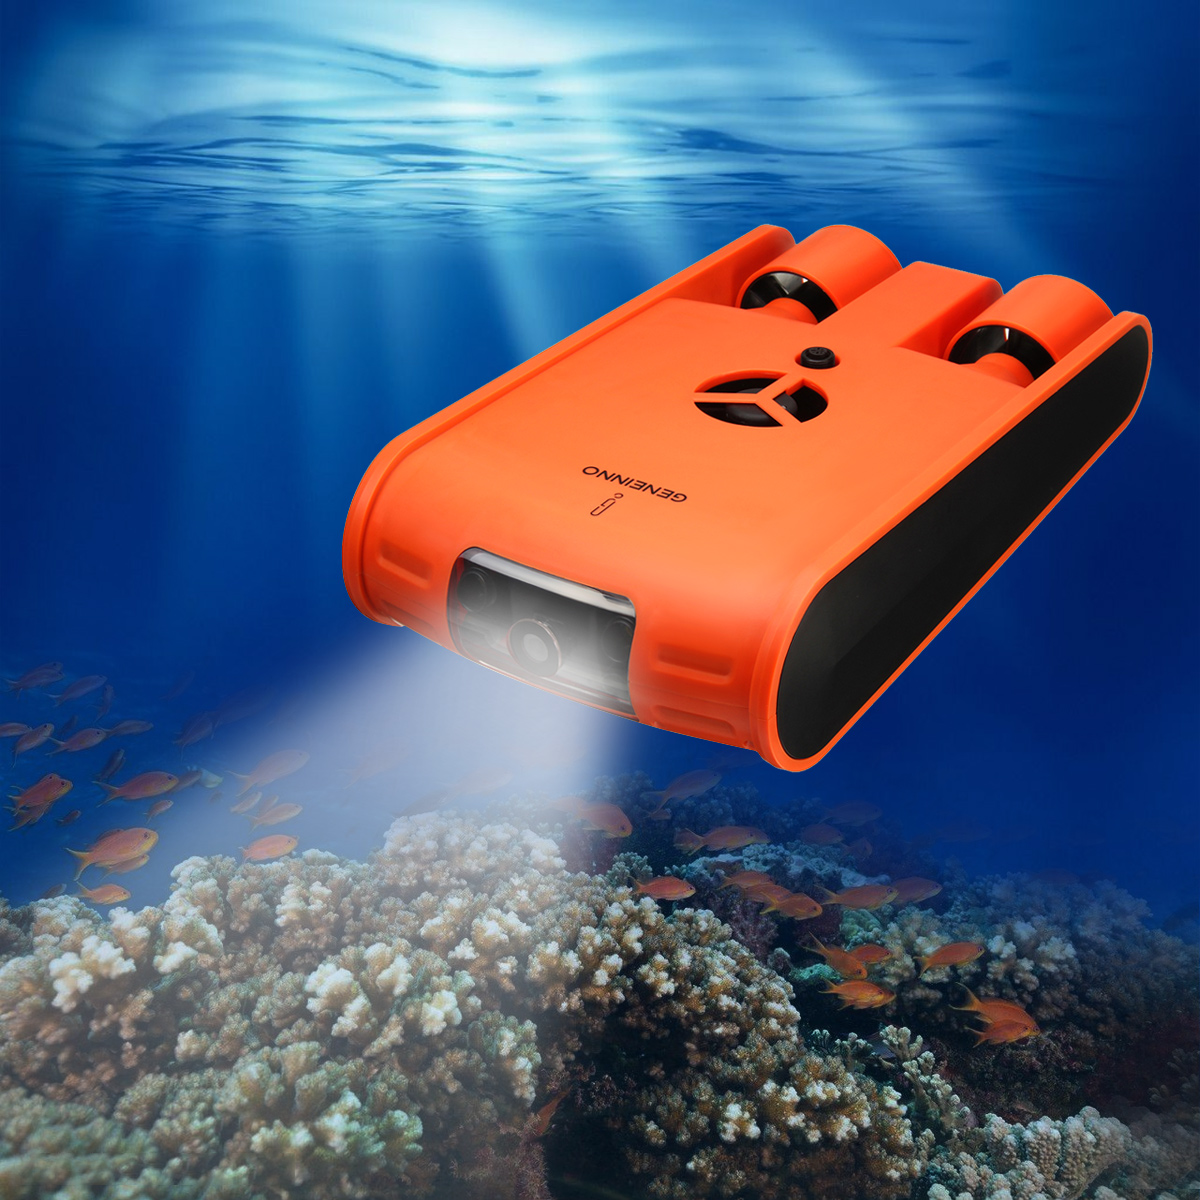 1 Set 1080 P HD 100 M Telecomando Macchina Fotografica Subacquea Drone Sottomarino Detection 32G macchina fotografica Subacquea Kit